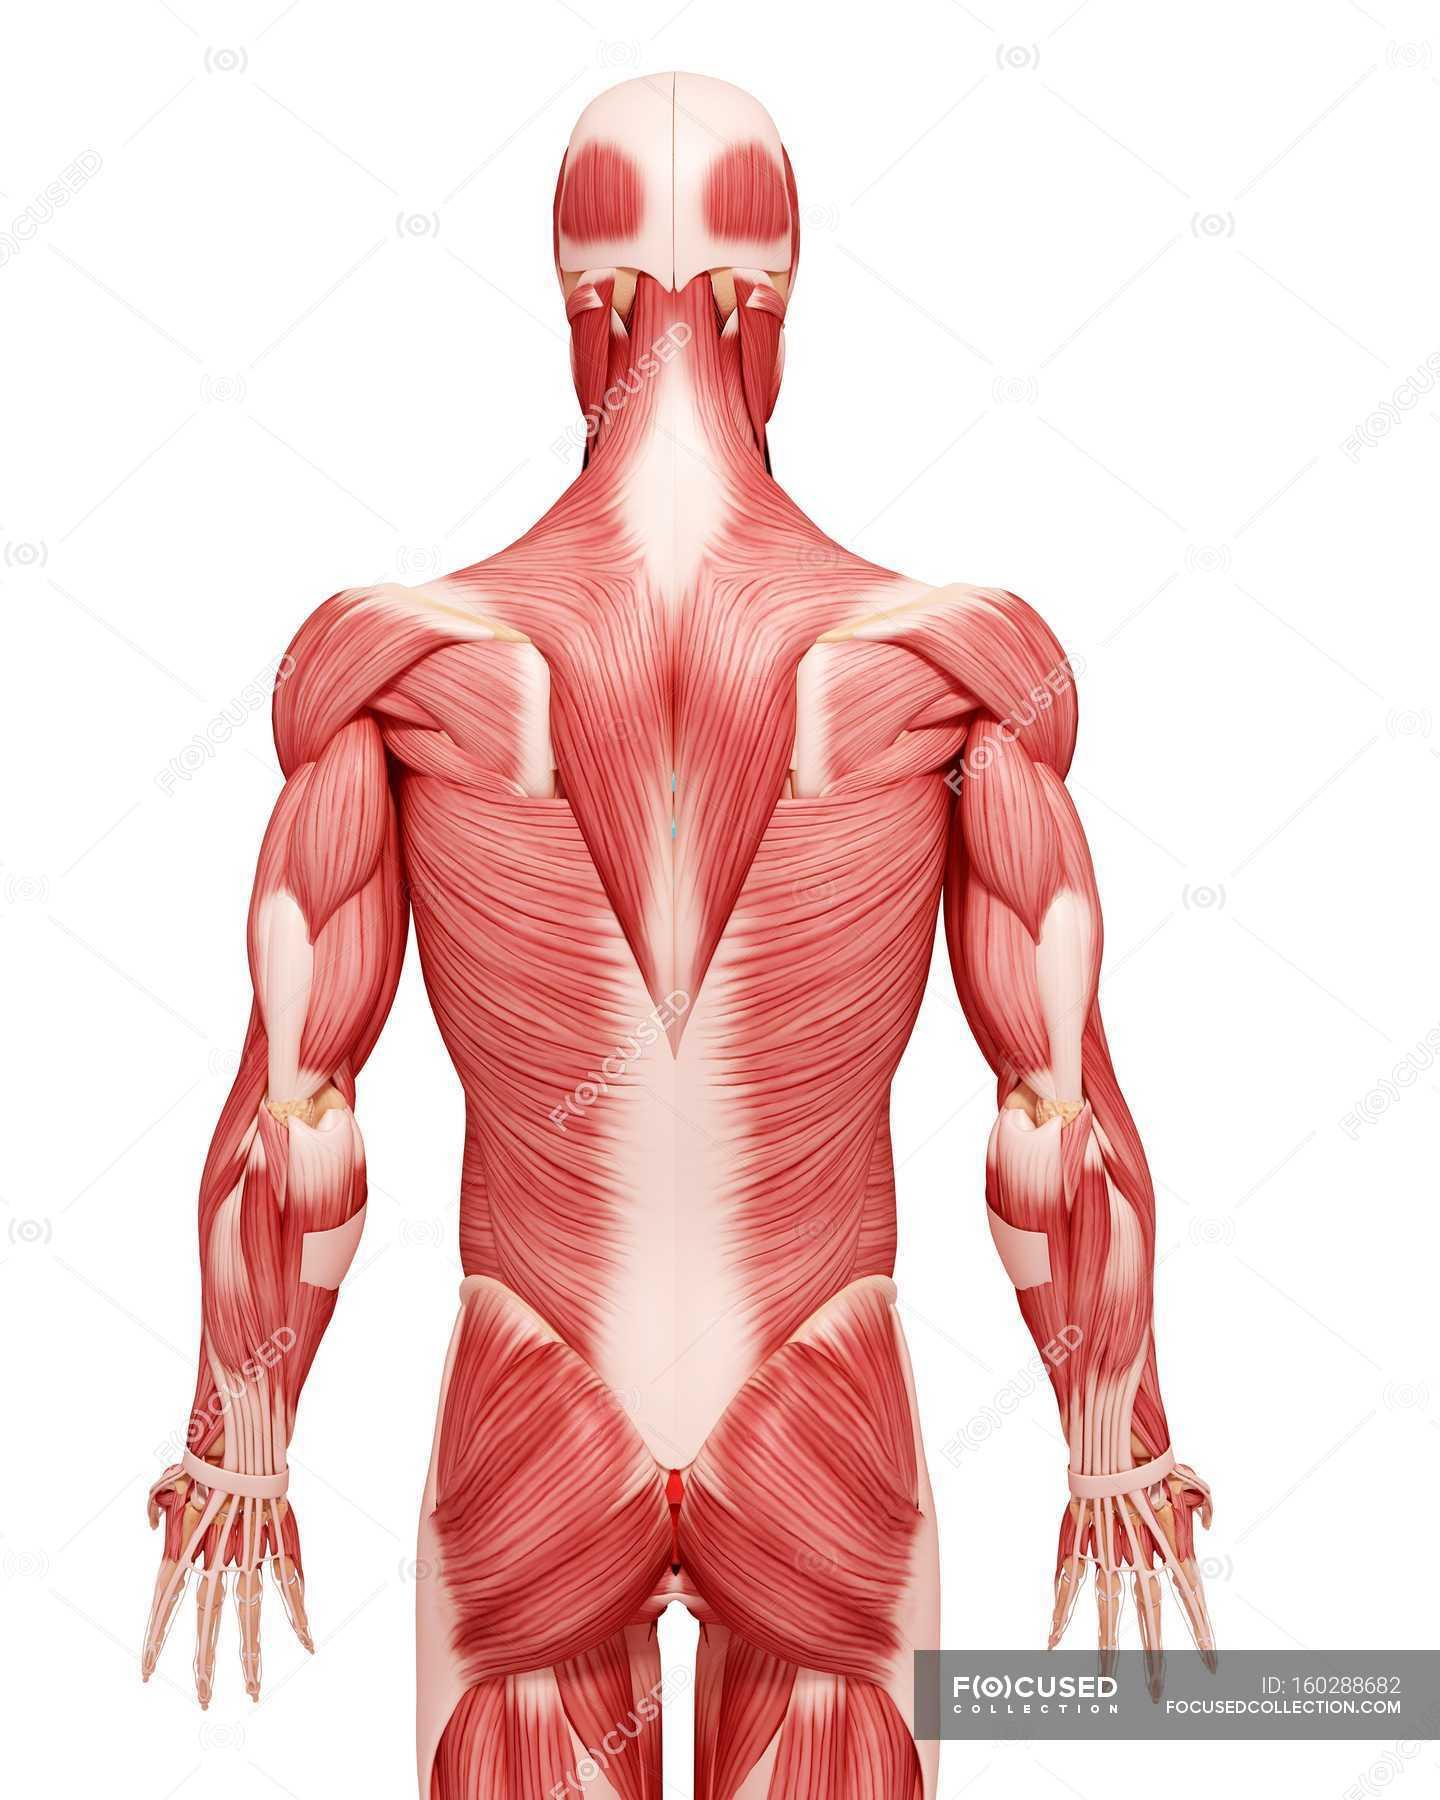 Männliche Muskulatur Anatomie — Stockfoto | #160288682